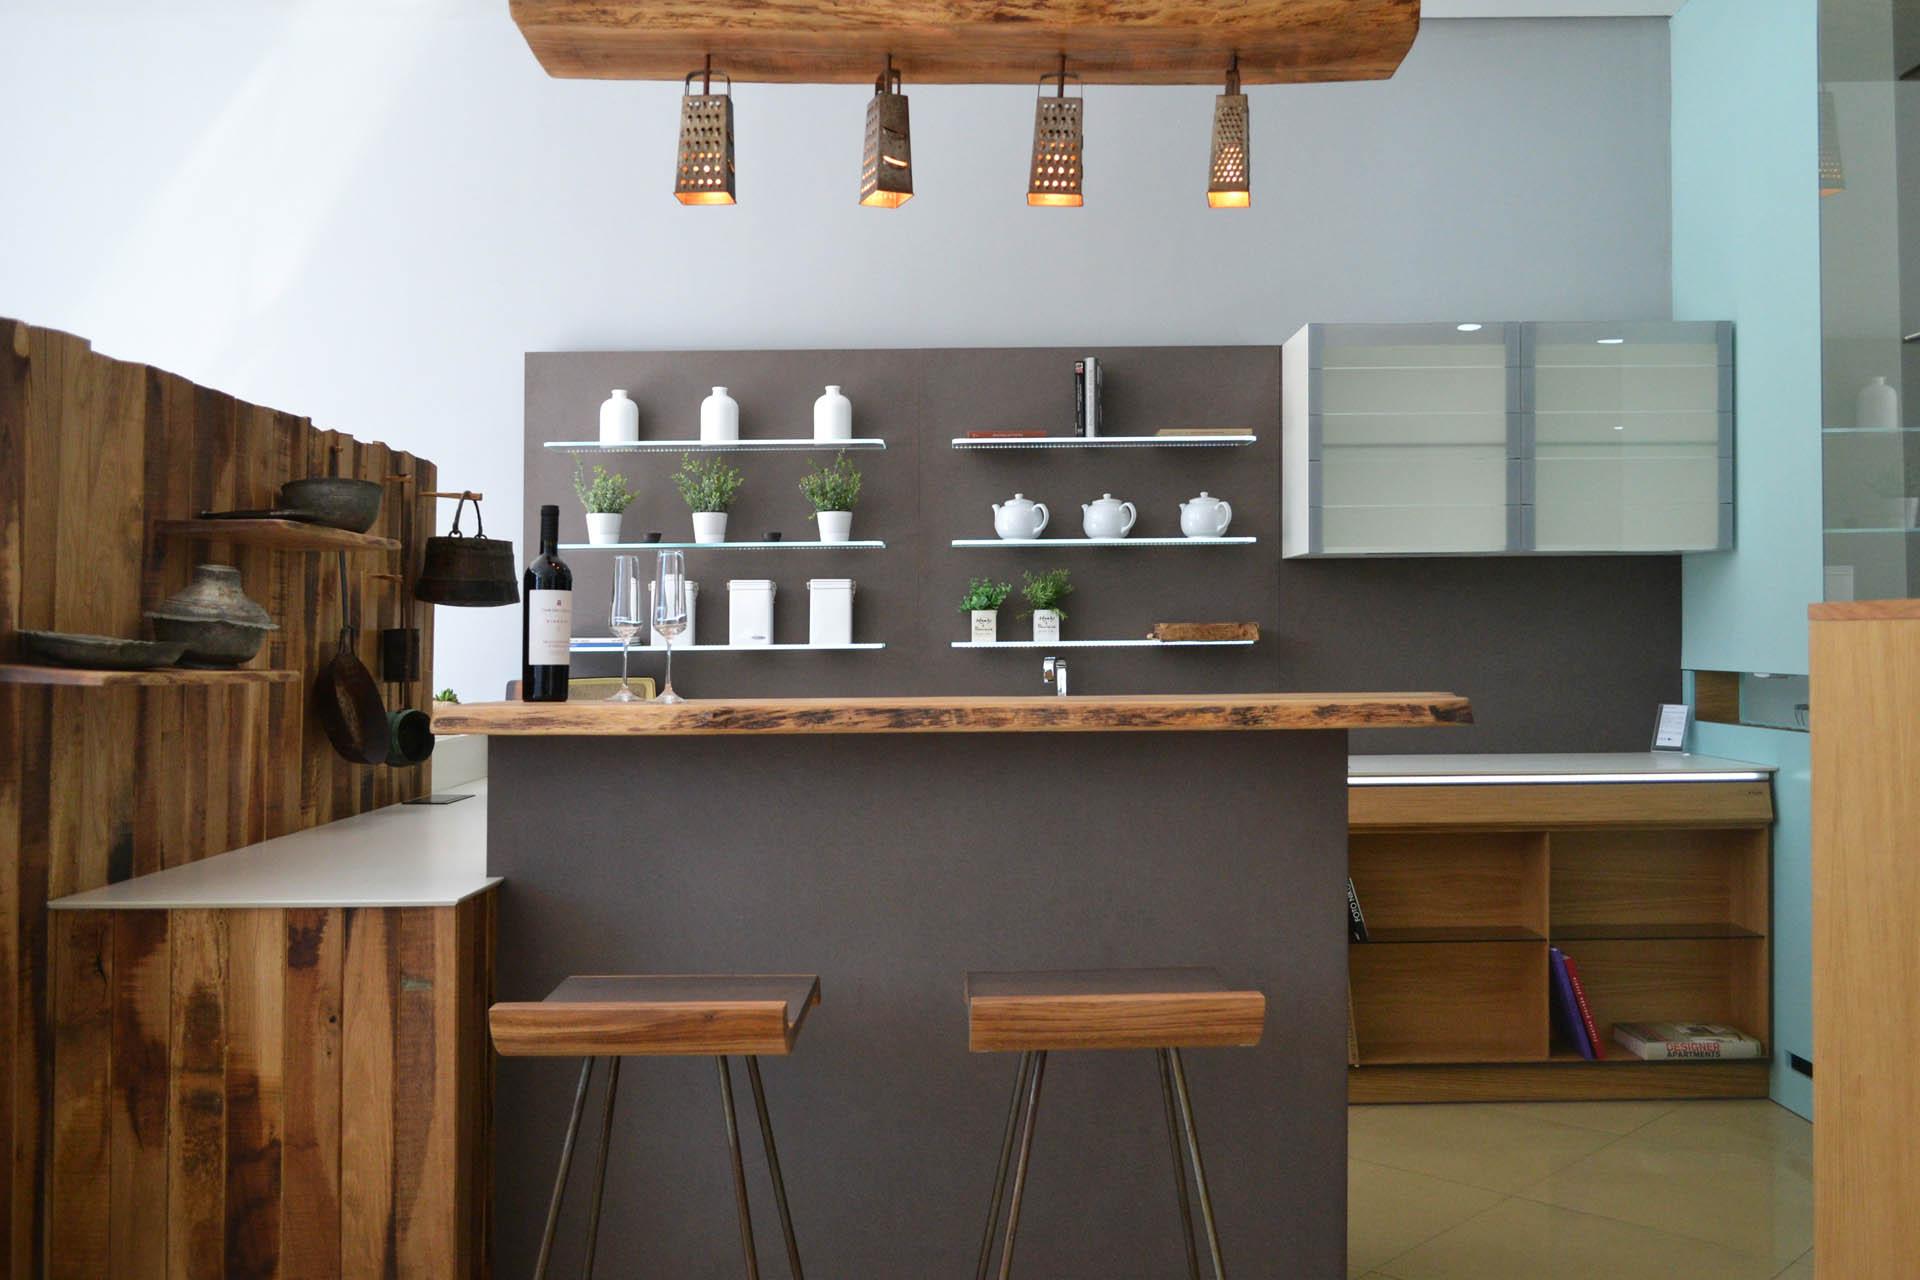 XYLON | Dizajn enterijera i nameštaja | Kuhinje